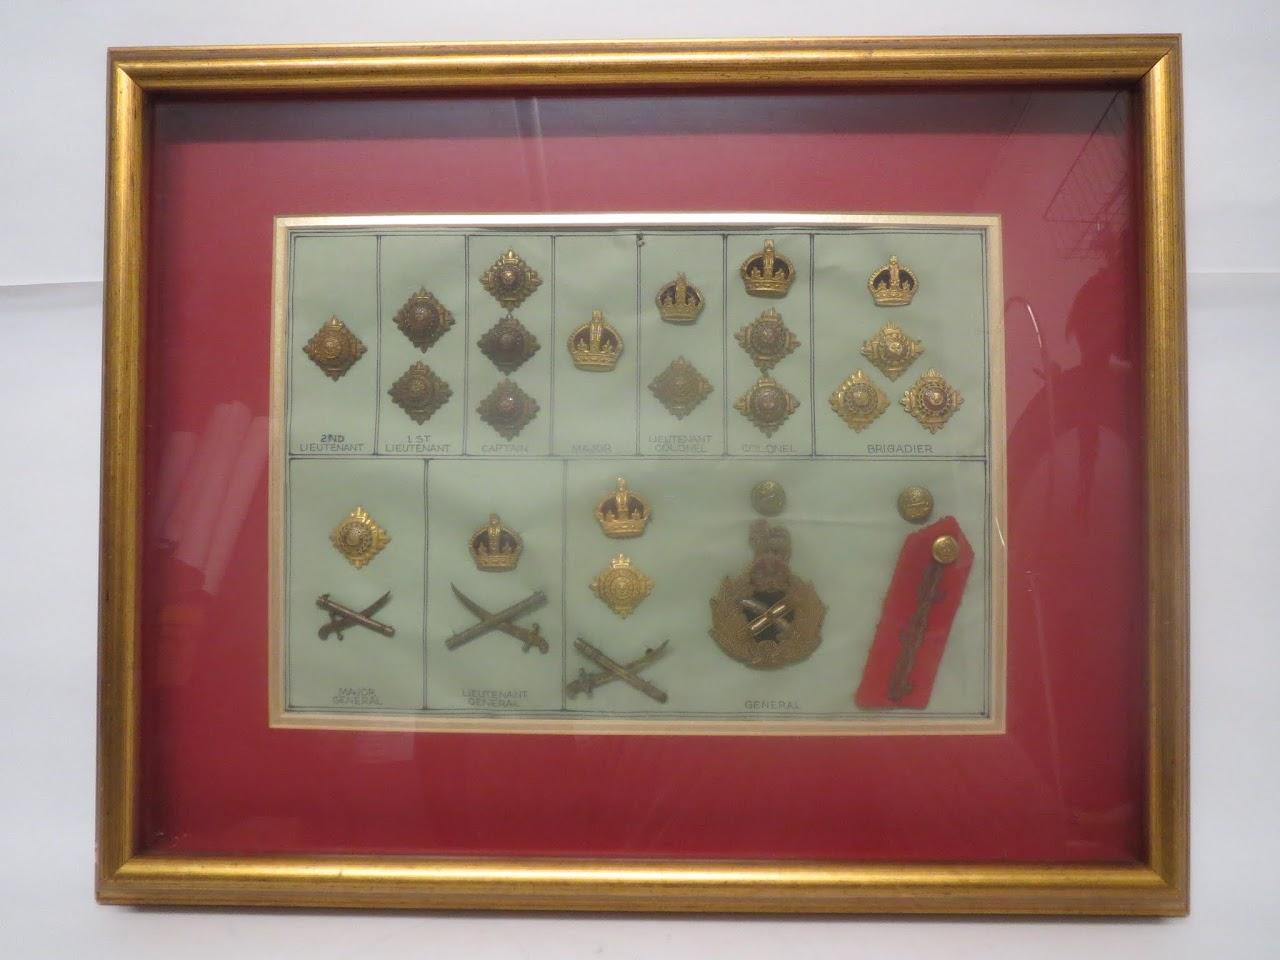 Framed British Military Insignias